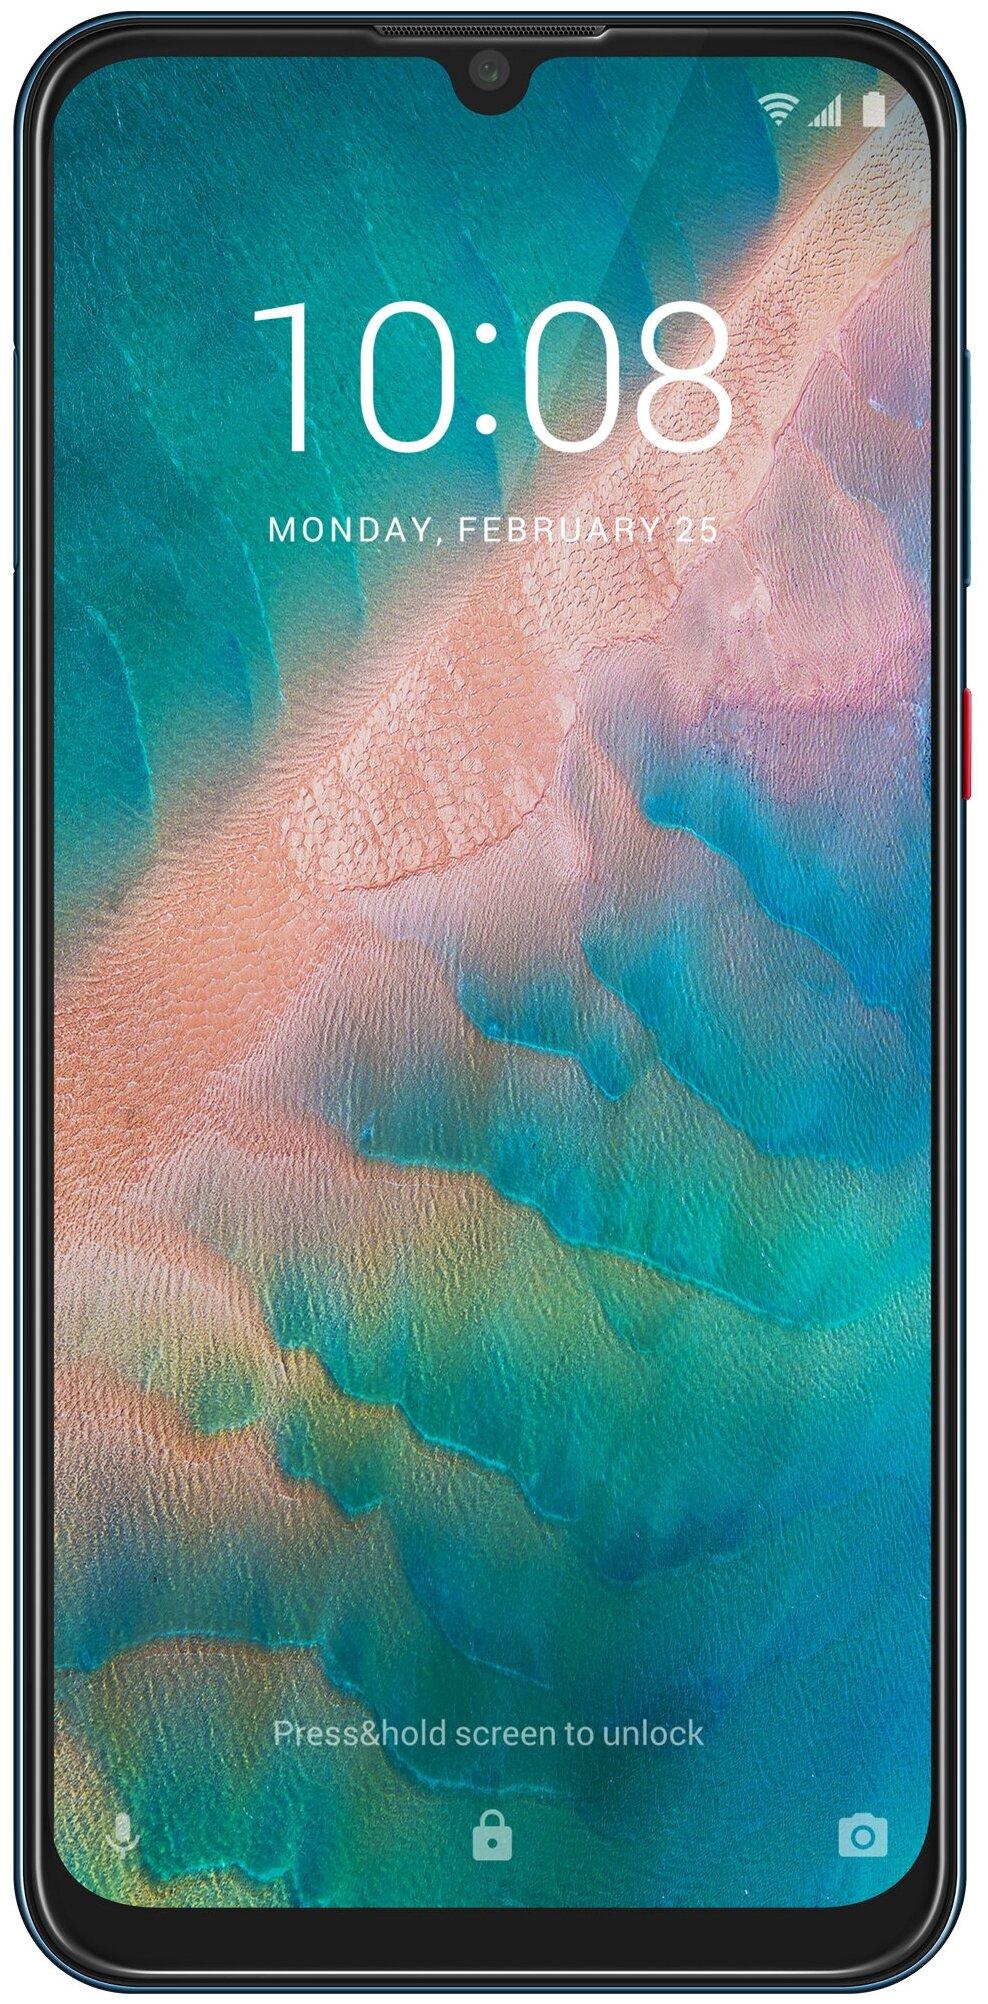 ZTE Blade V10 - операционная система: Android 9.0